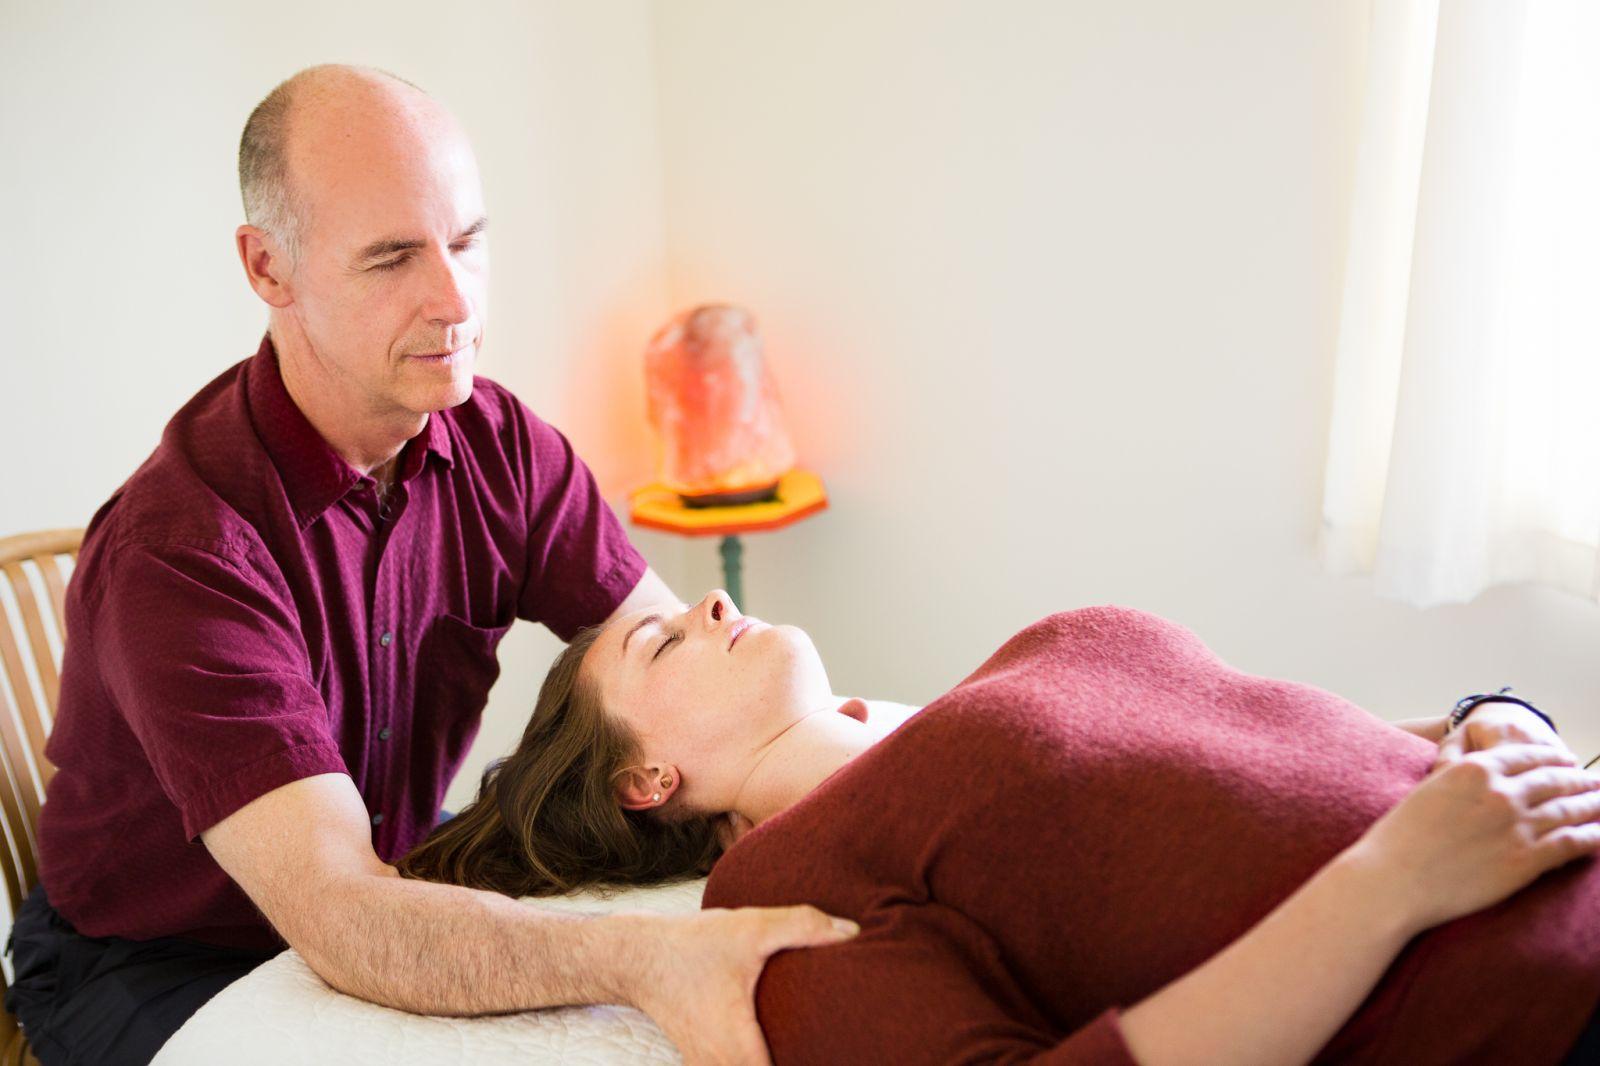 Aumkara Newhouse applying Meridian Charging Therapy - Jin shin Jyutsu to base of skull and shoulder